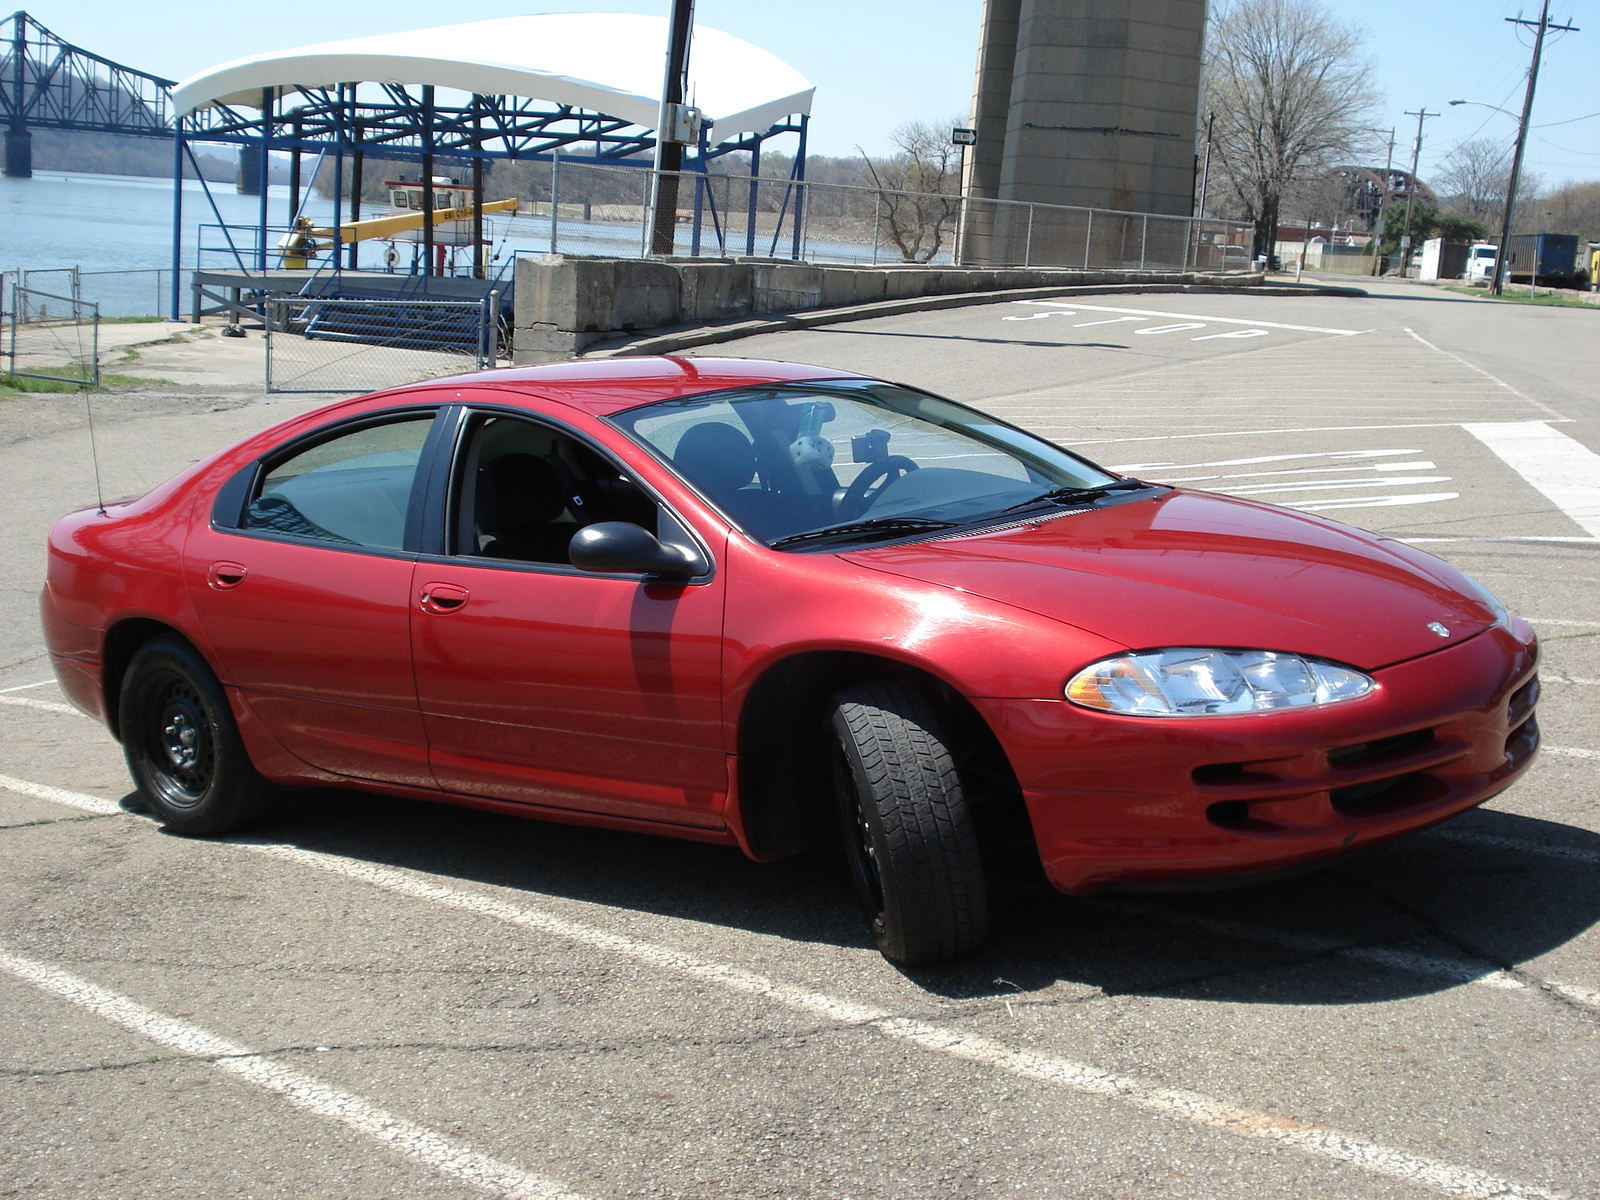 2002 Dodge Intrepid 16 Dodge